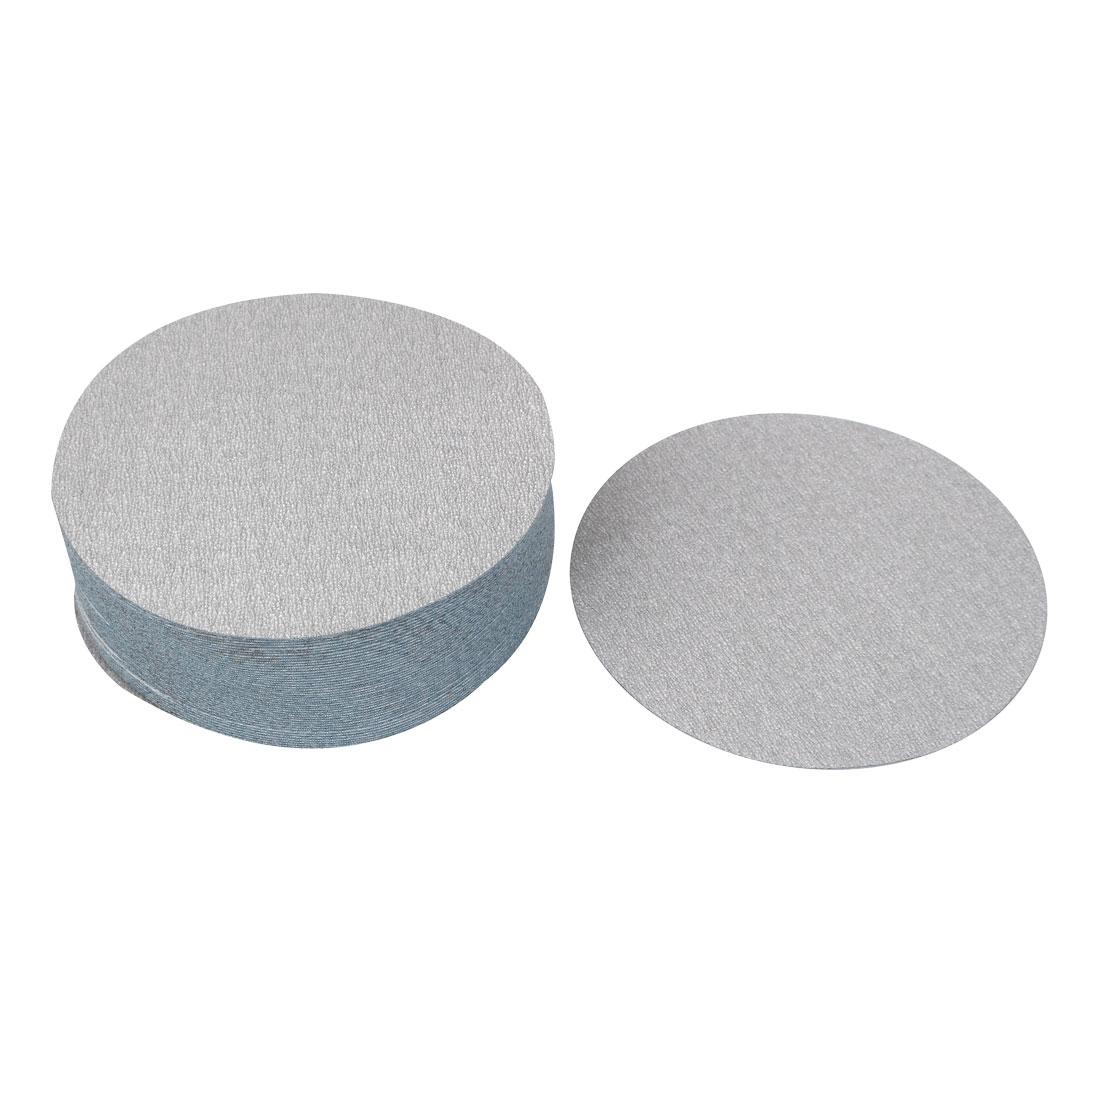 "6"" Dia Polishing Round Abrasive Sanding Sandpaper Sheet Disc 400 Grit 50 Pcs"